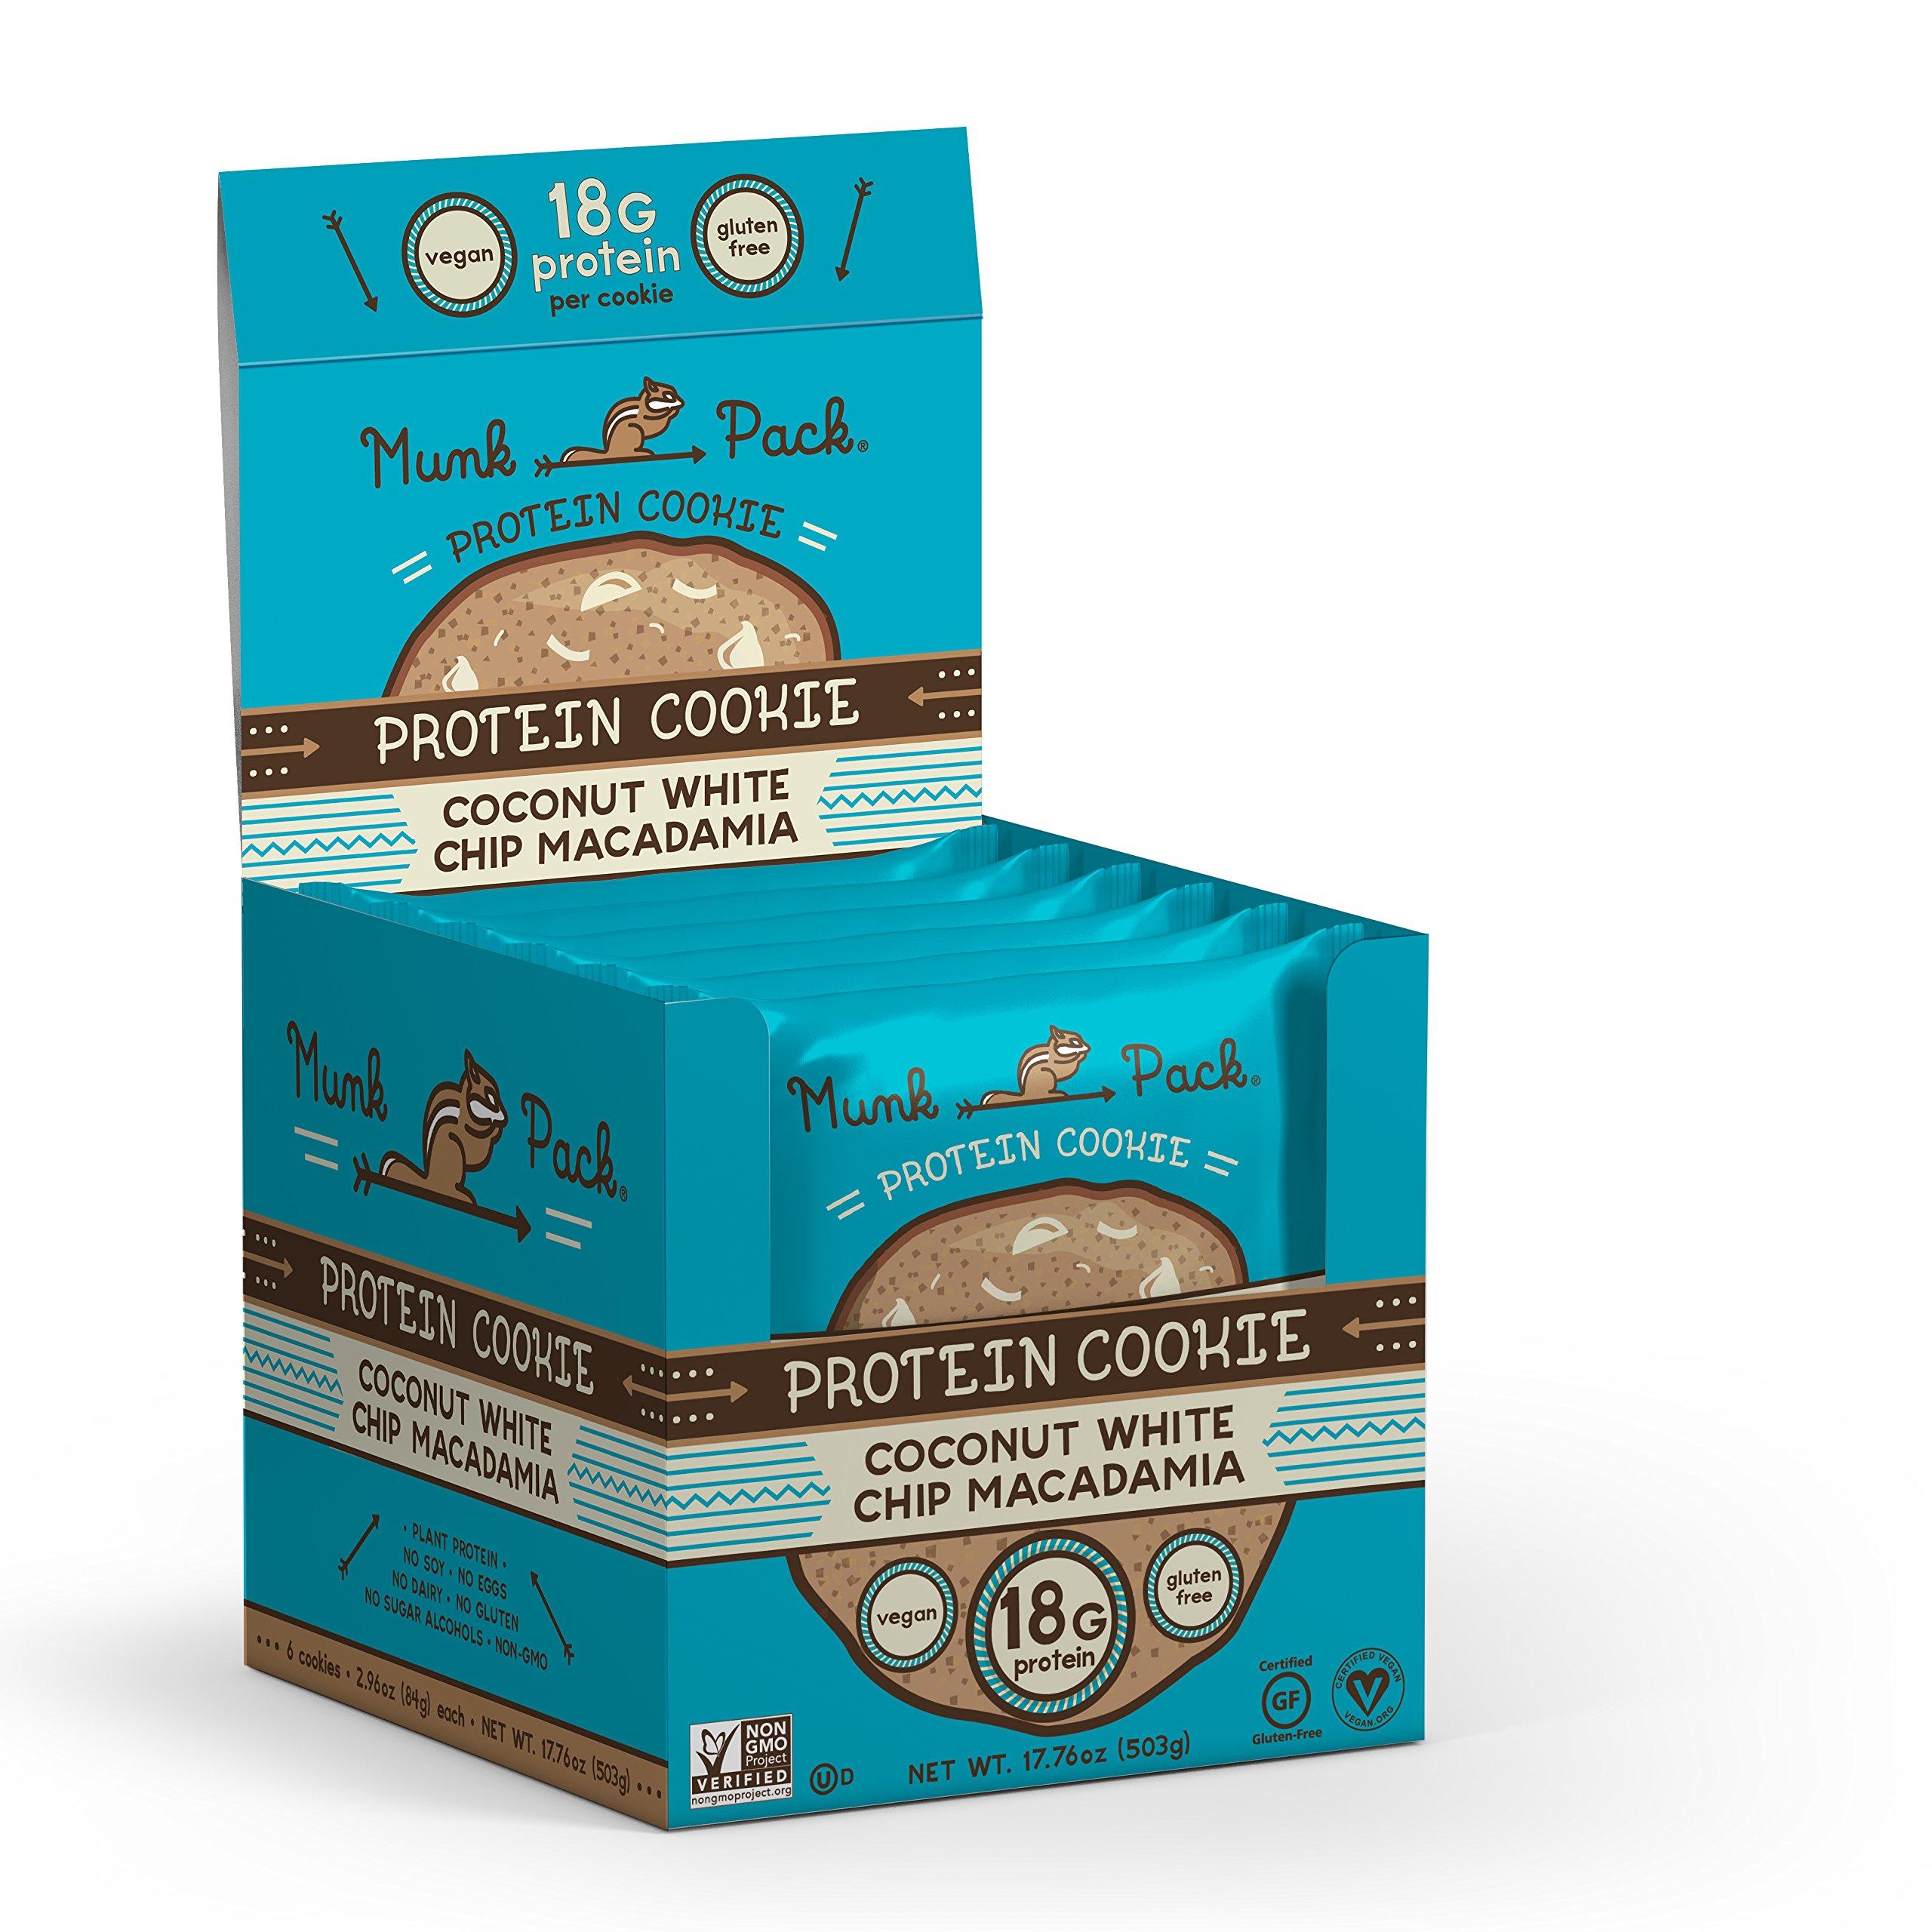 Munk Pack - Coconut White Chip Macadamia - Protein Cookie - 6 Pack - 18g Protein, Vegan, Gluten-Free, Soft Baked - 2.96oz